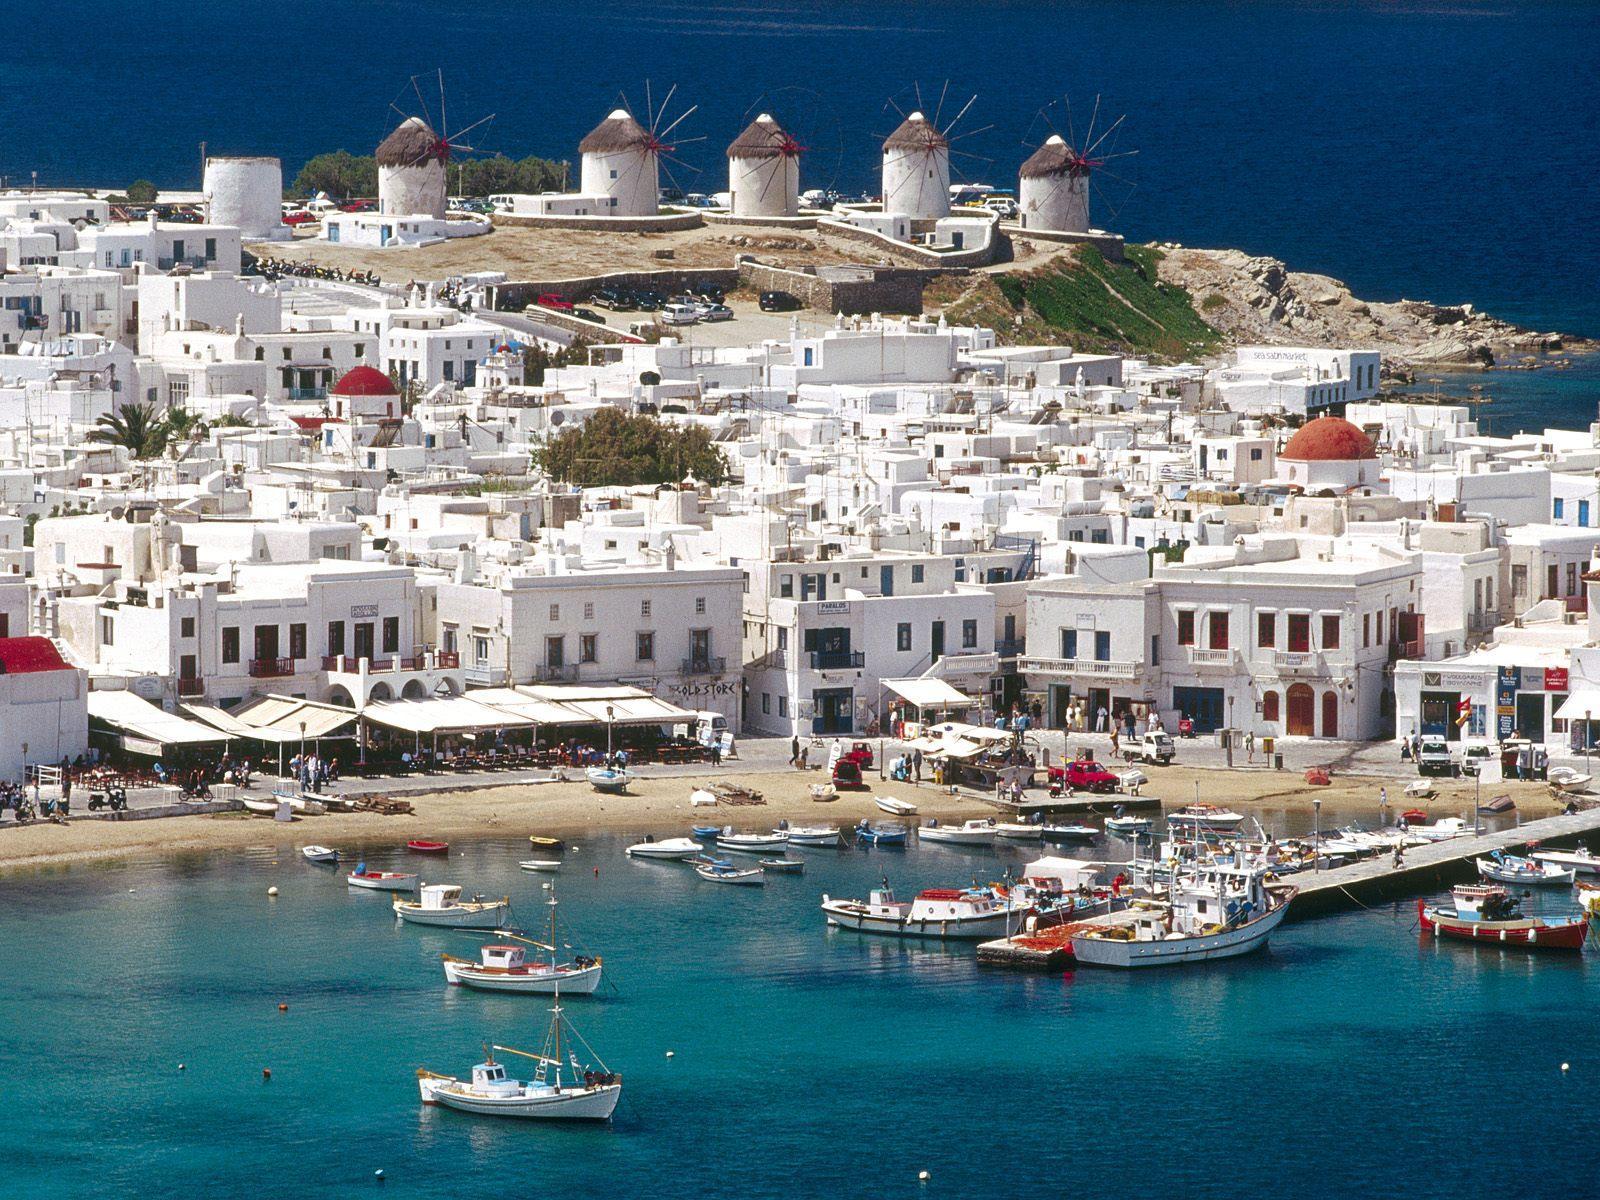 Mykonos Cyclades Greece - ავიაბილეთები მიკონოსი